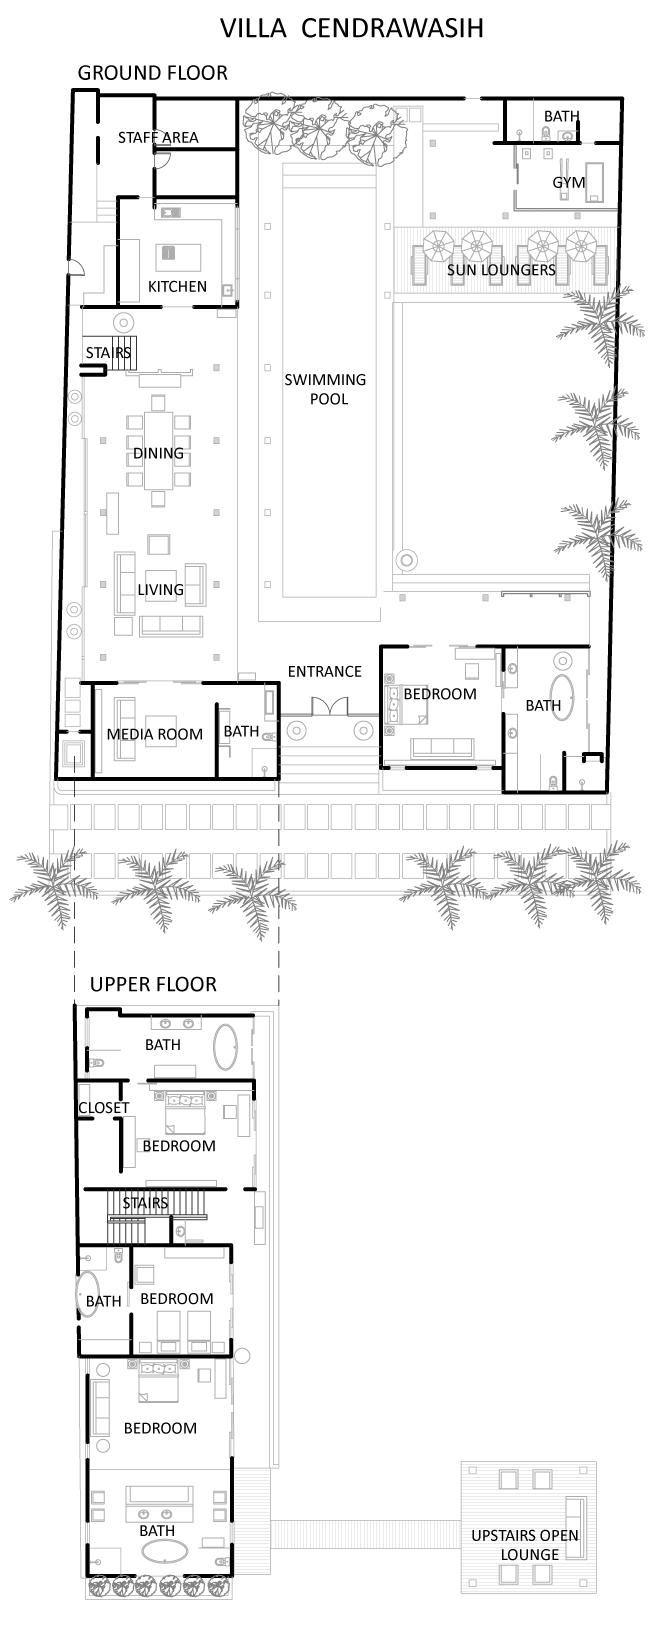 Villa Cendrawasih Bali Style Home Hotel Floor Plan Bali House